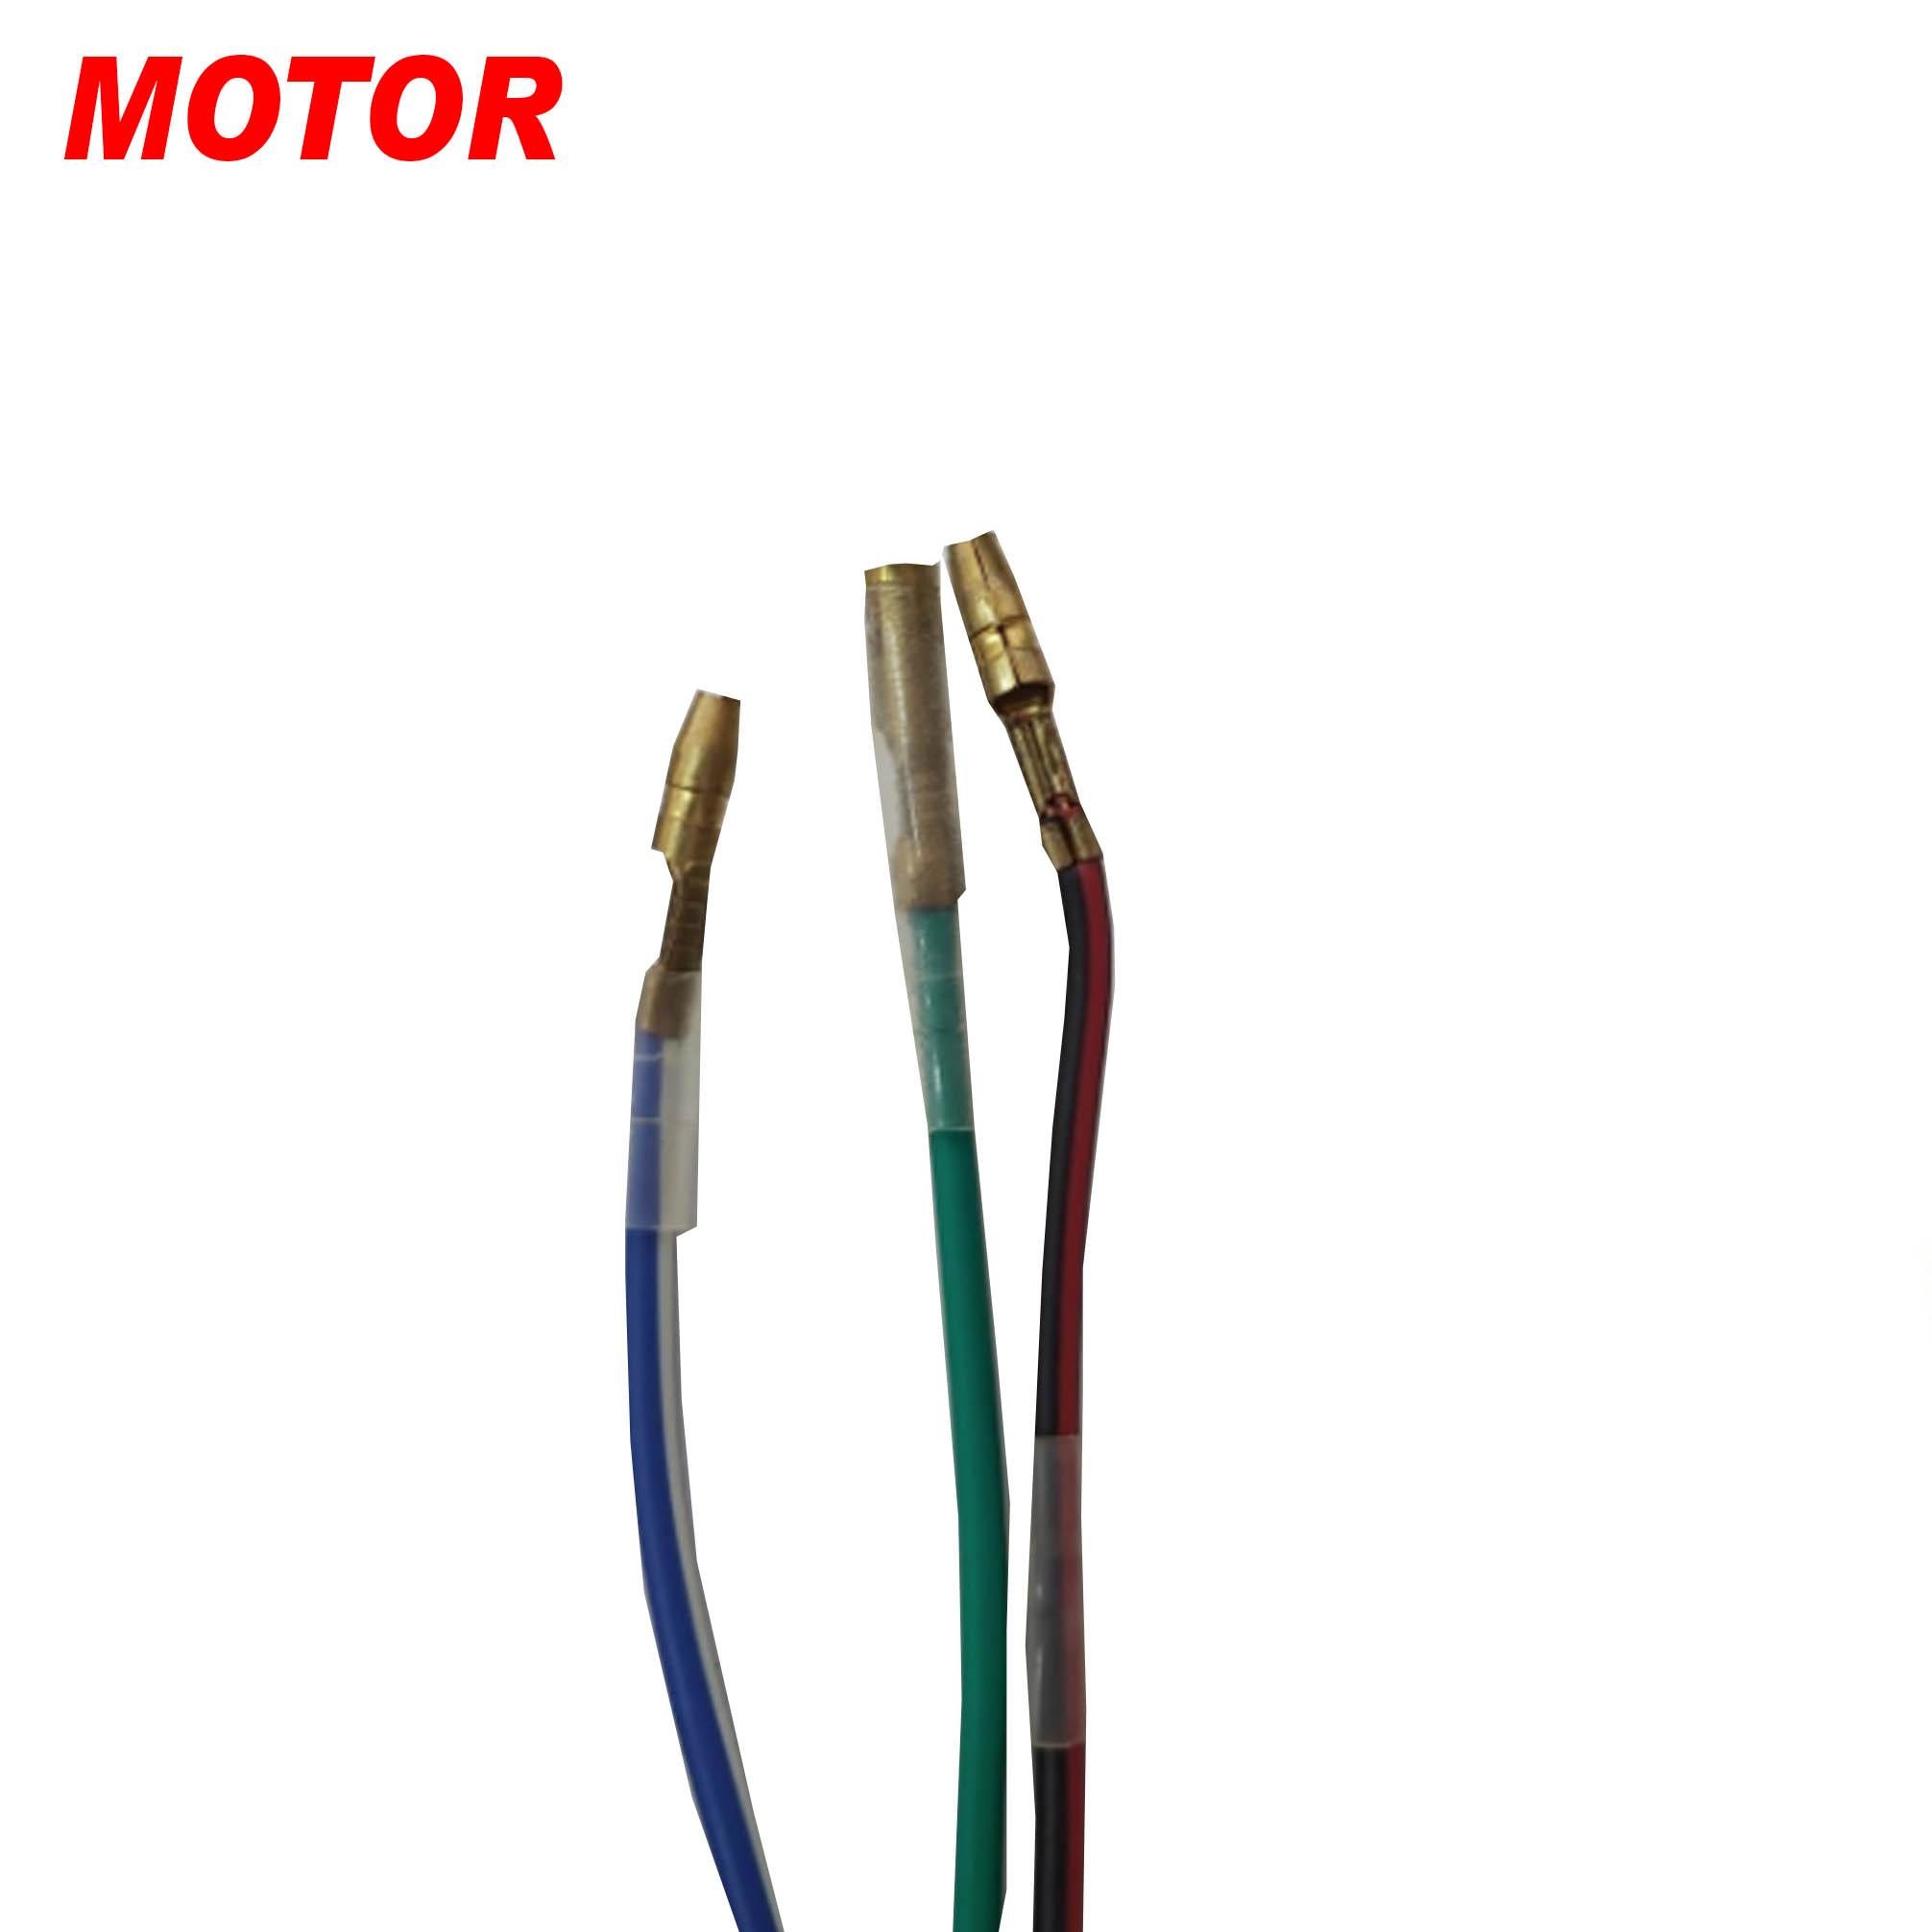 MOTOR-1.jpg